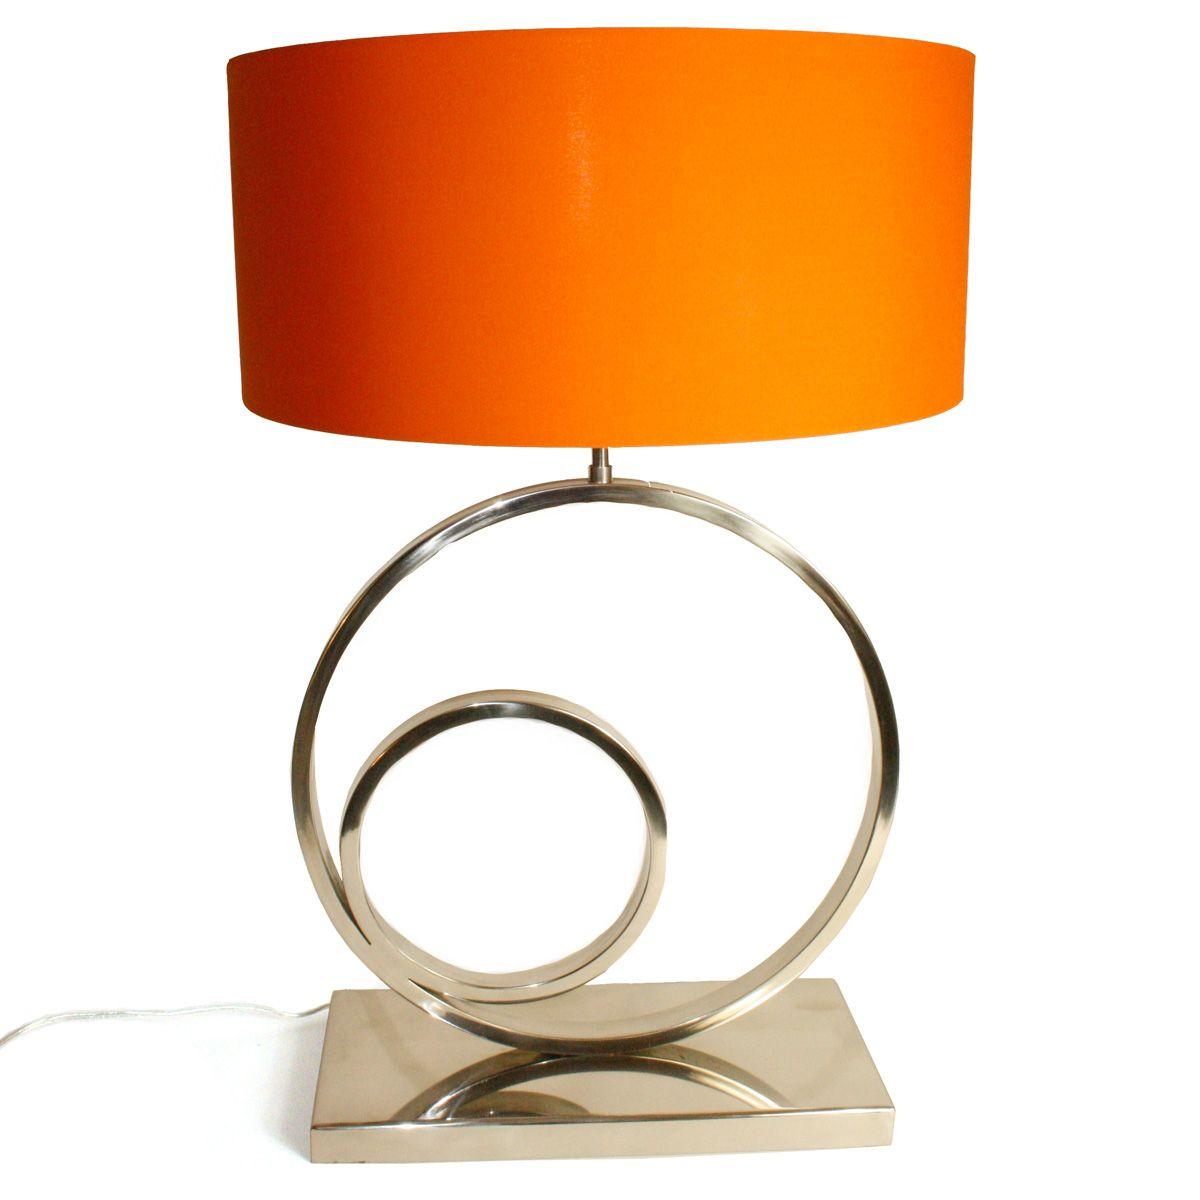 Moderne Lampen-Designs http://amirior.de/Produkte/lampen/5   amirior ...